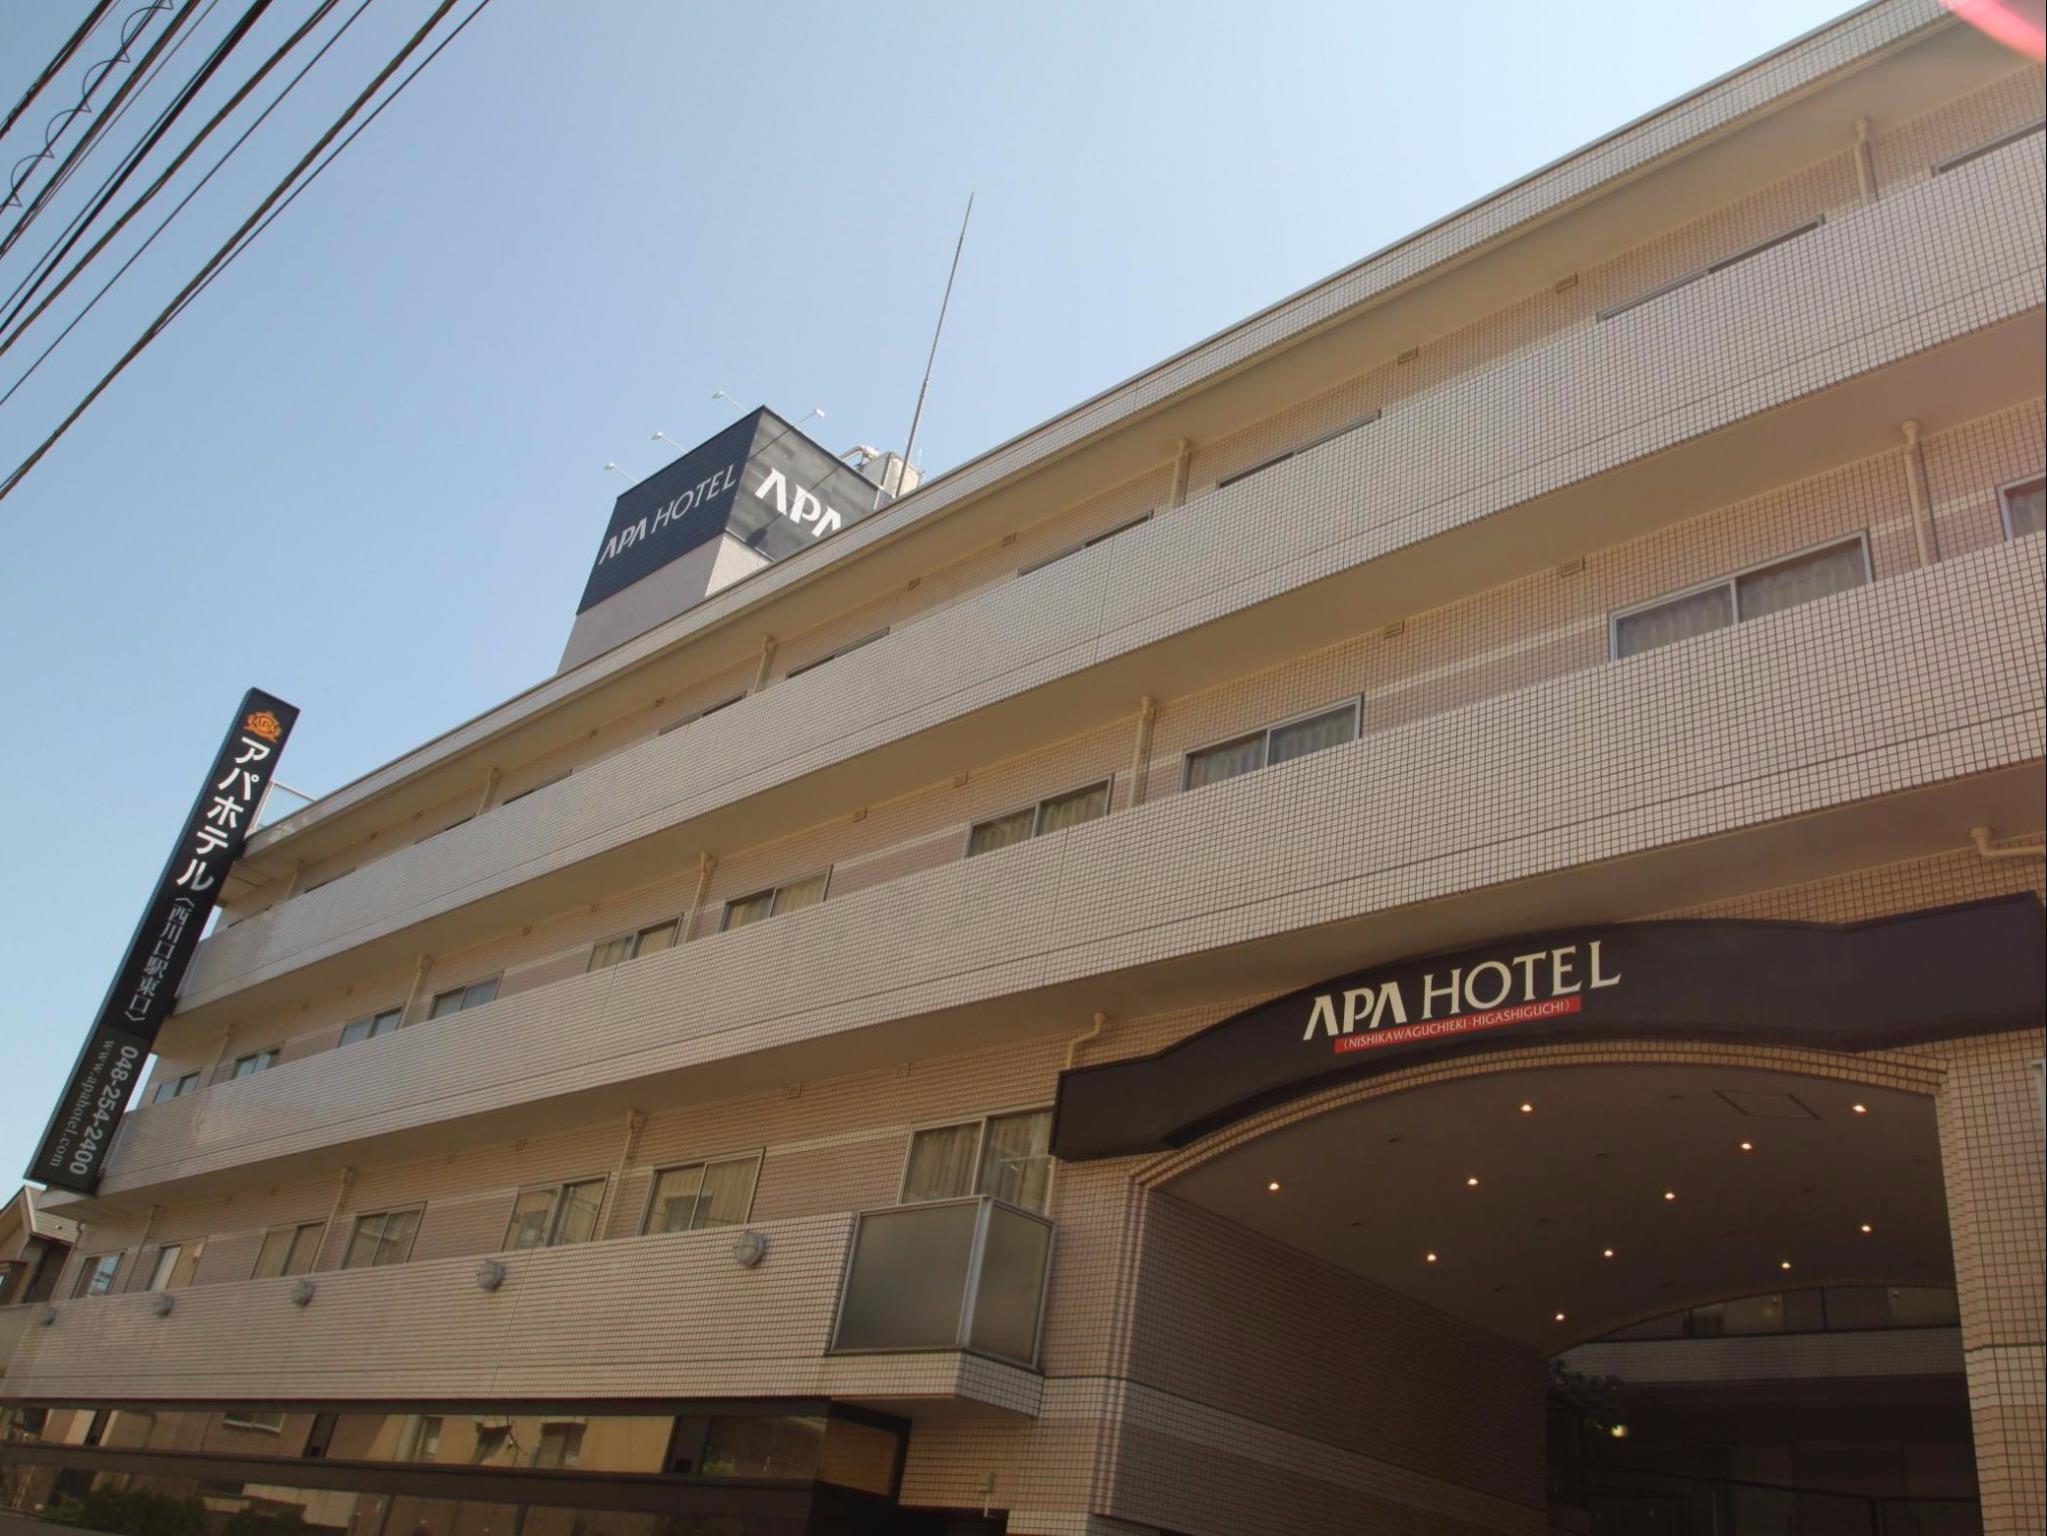 APA Hotel Nishi Kawaguchi Higashi Guchi